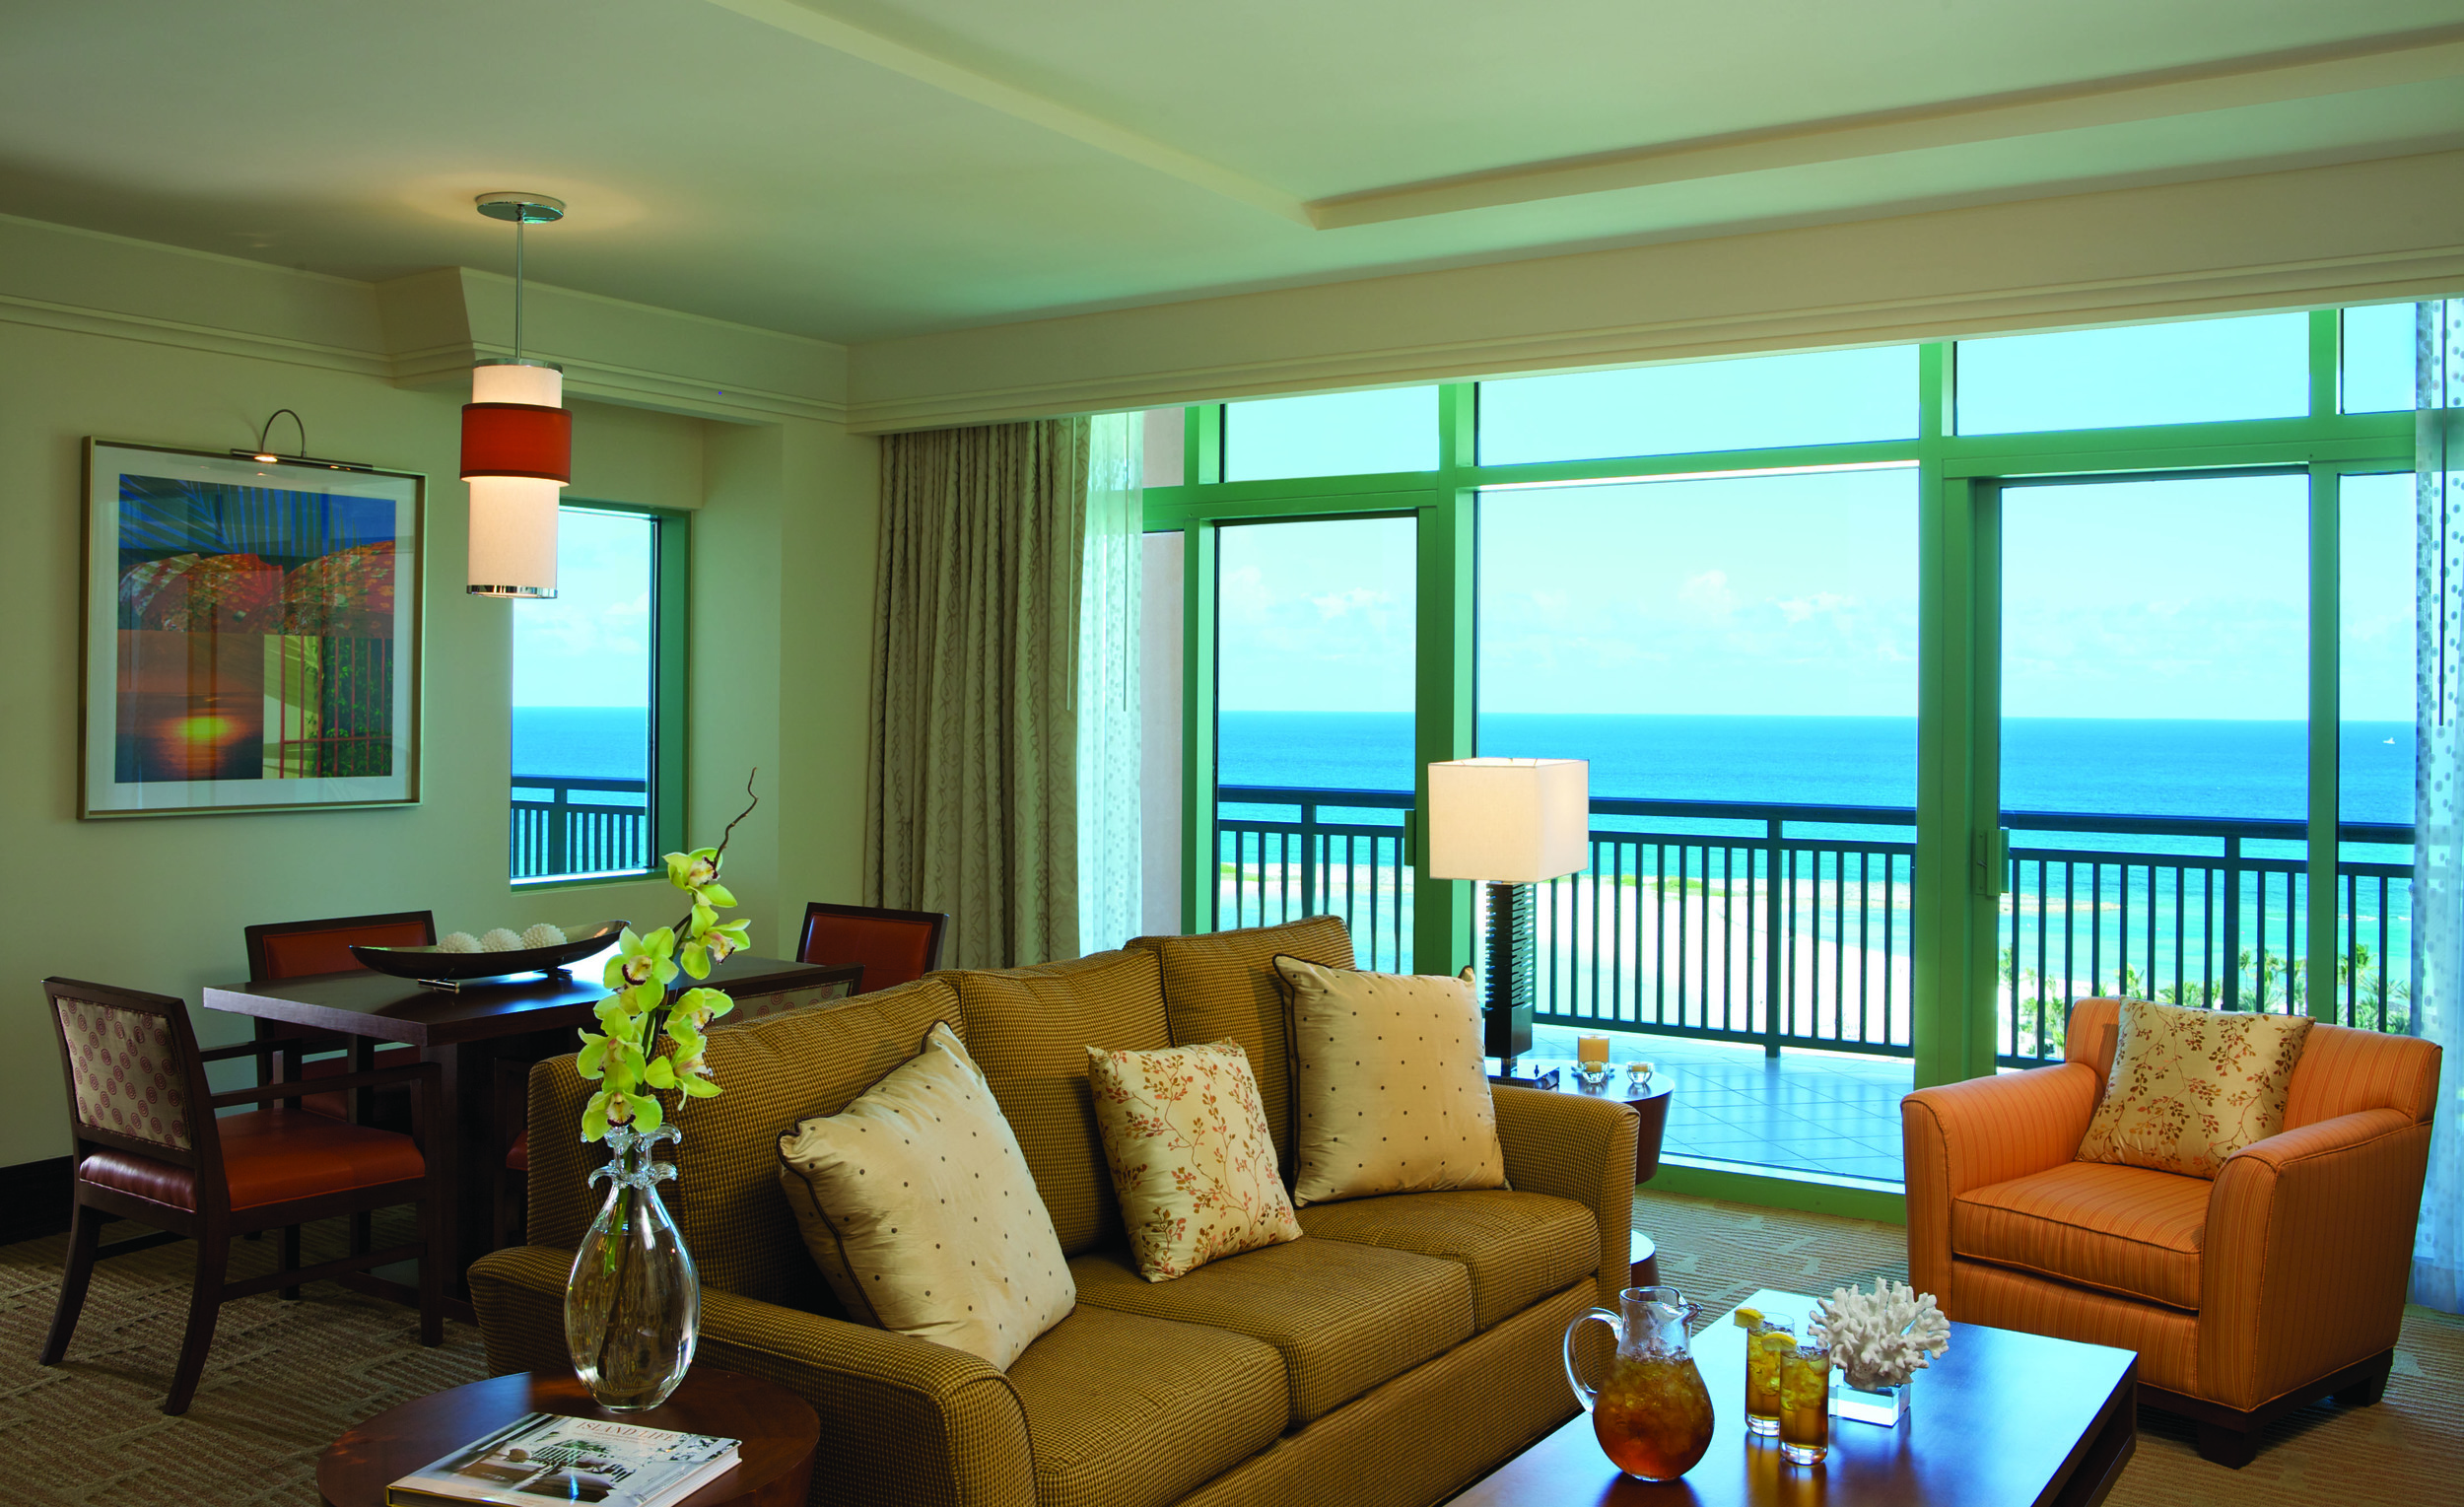 Topaz_Suite_-_Living_Room_1371_standard.jpg